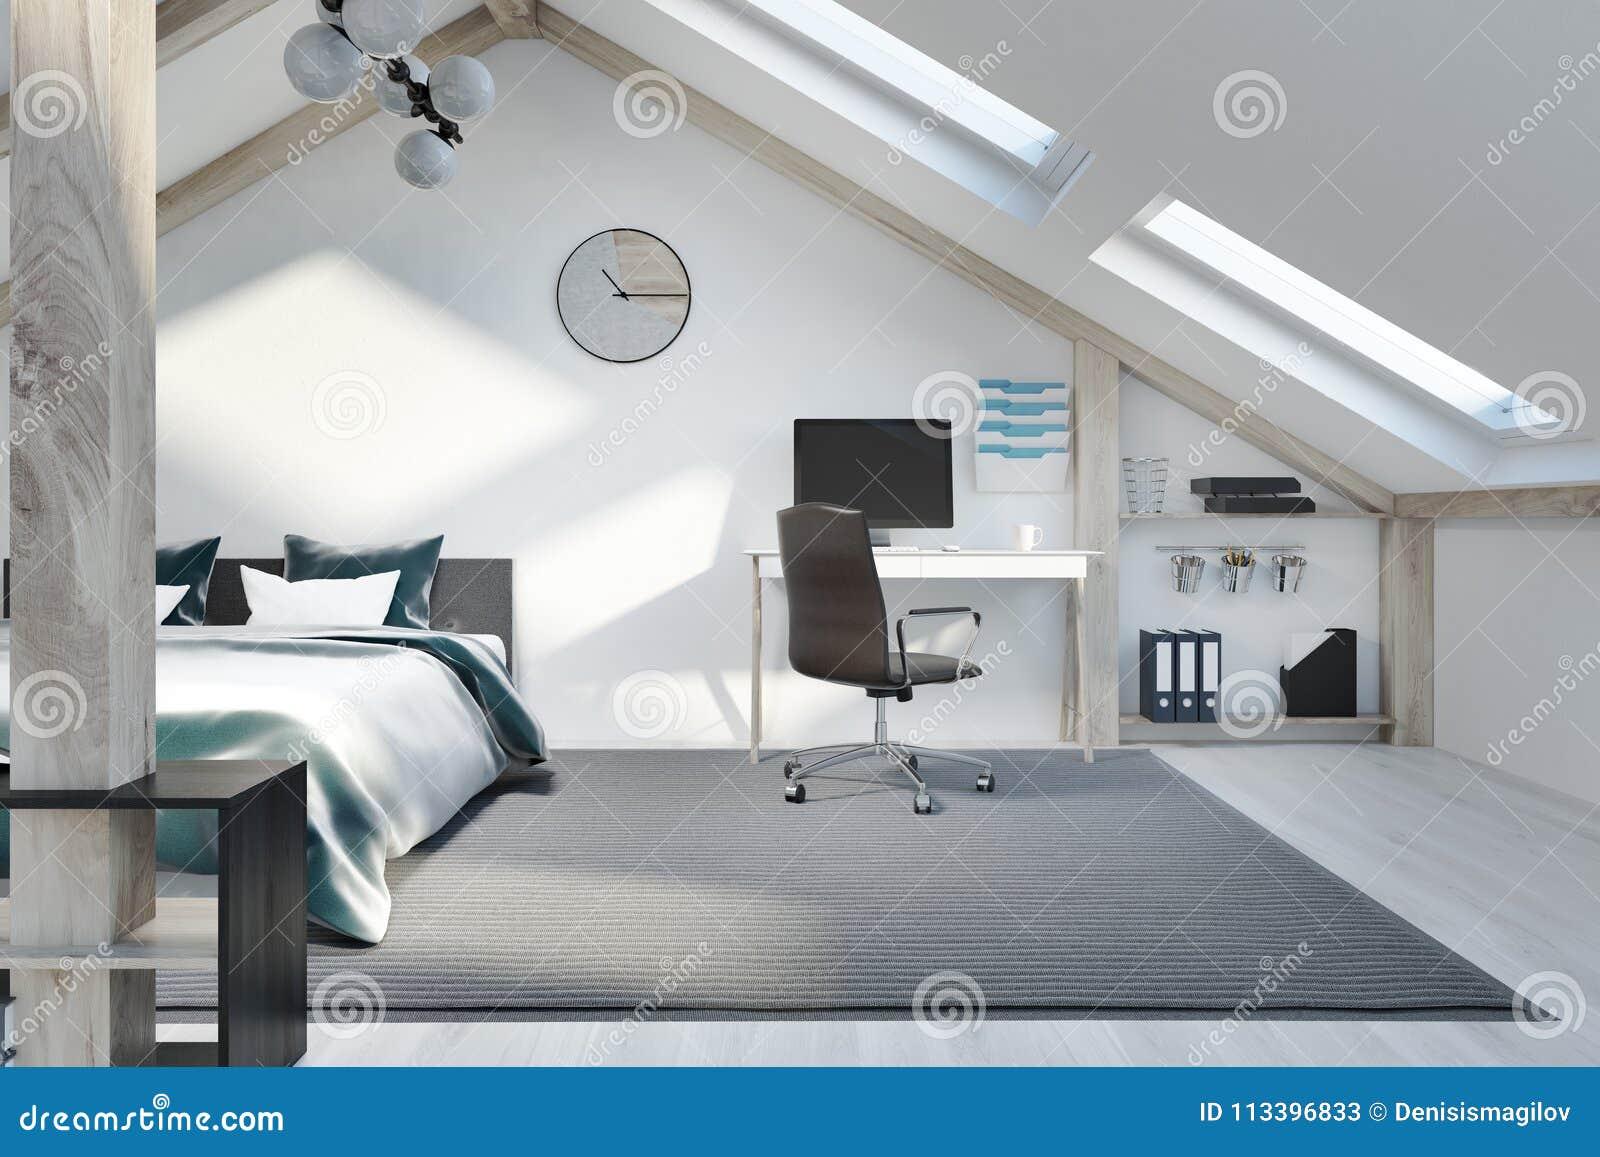 Attic Bedroom And Home Office Interior Stock Illustration Illustration Of Garret Minimalist 113396833